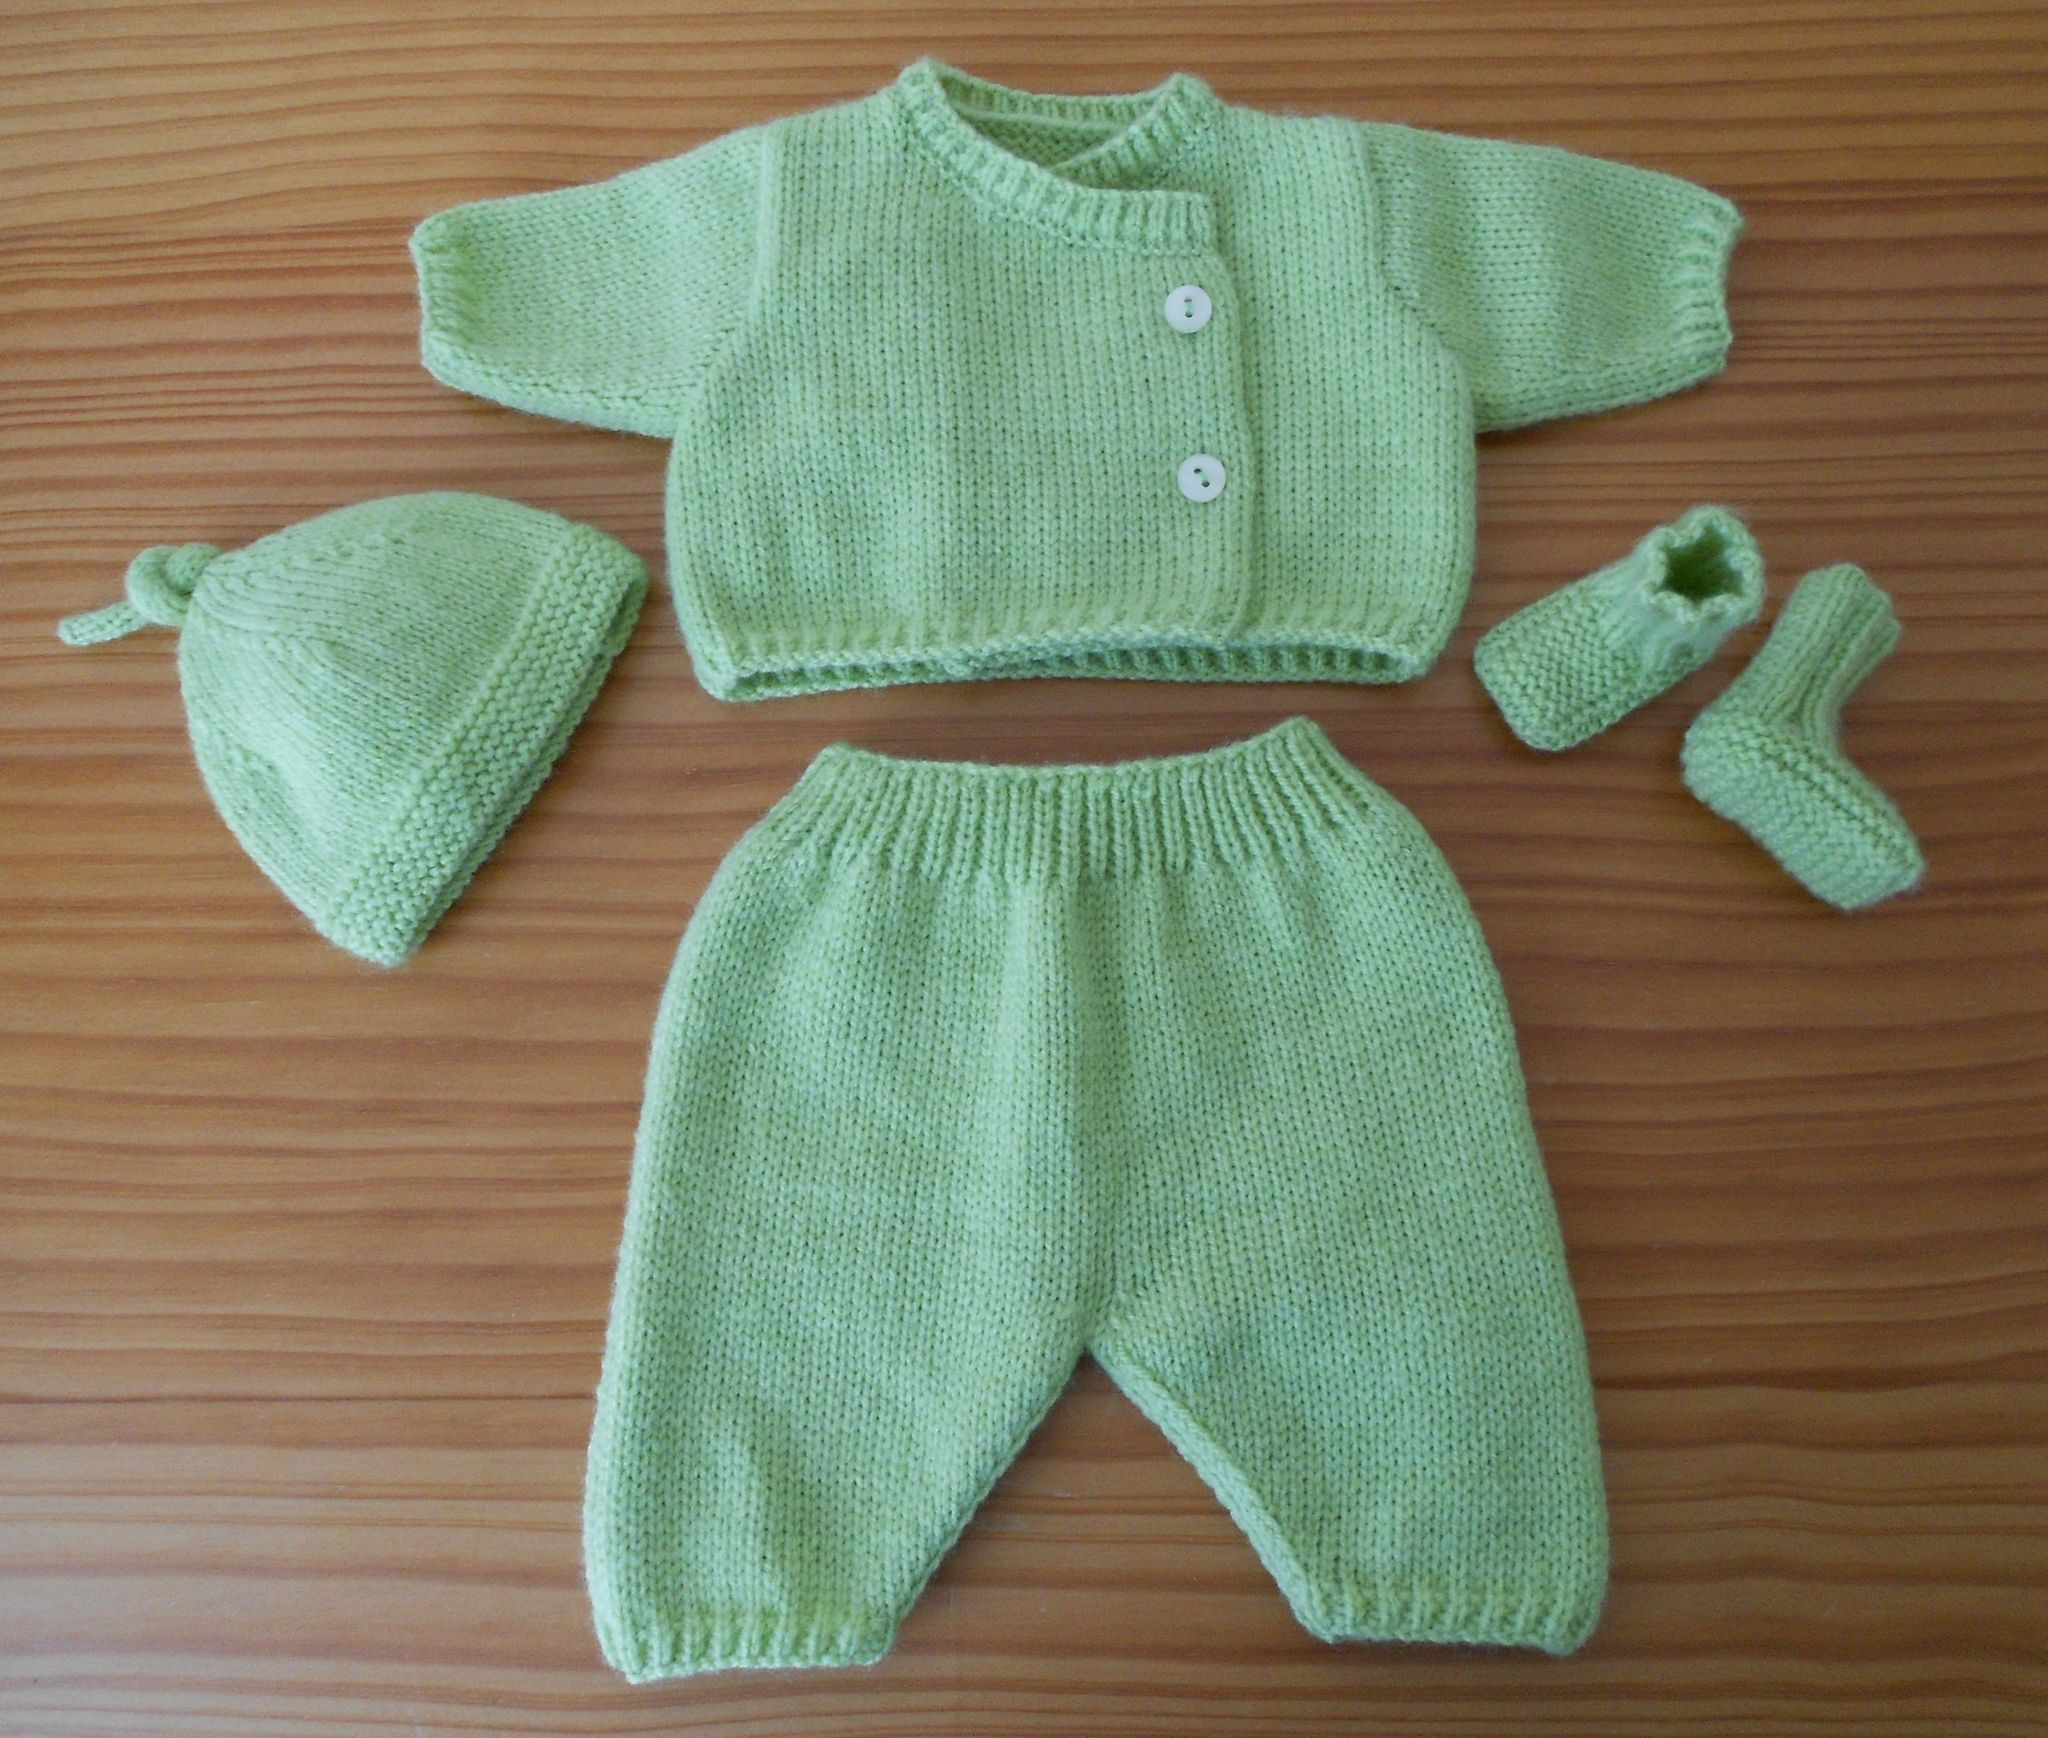 cd49c279494cb A tricoter pour bebe - Chapka